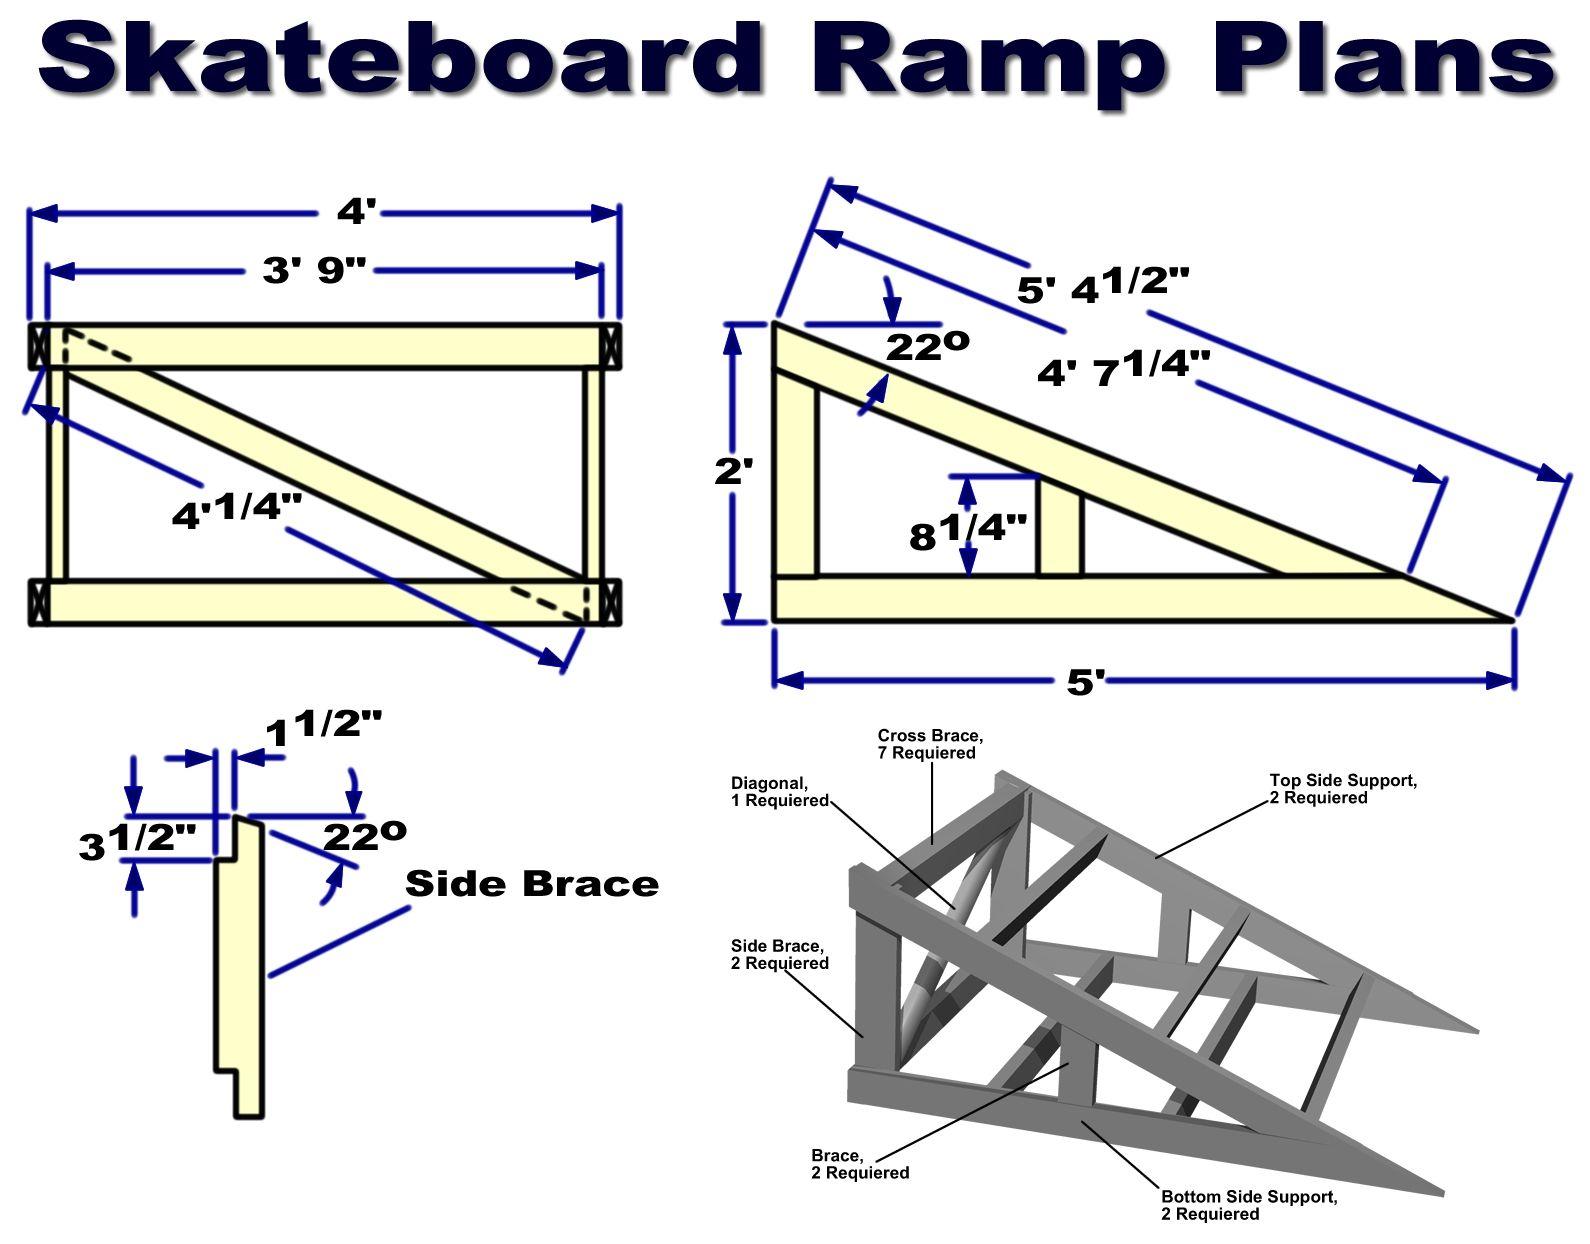 Free mini halfpipe plans - Skateboard Ramp Plans L D2827ee331e166e0 Jpg 1590 1244